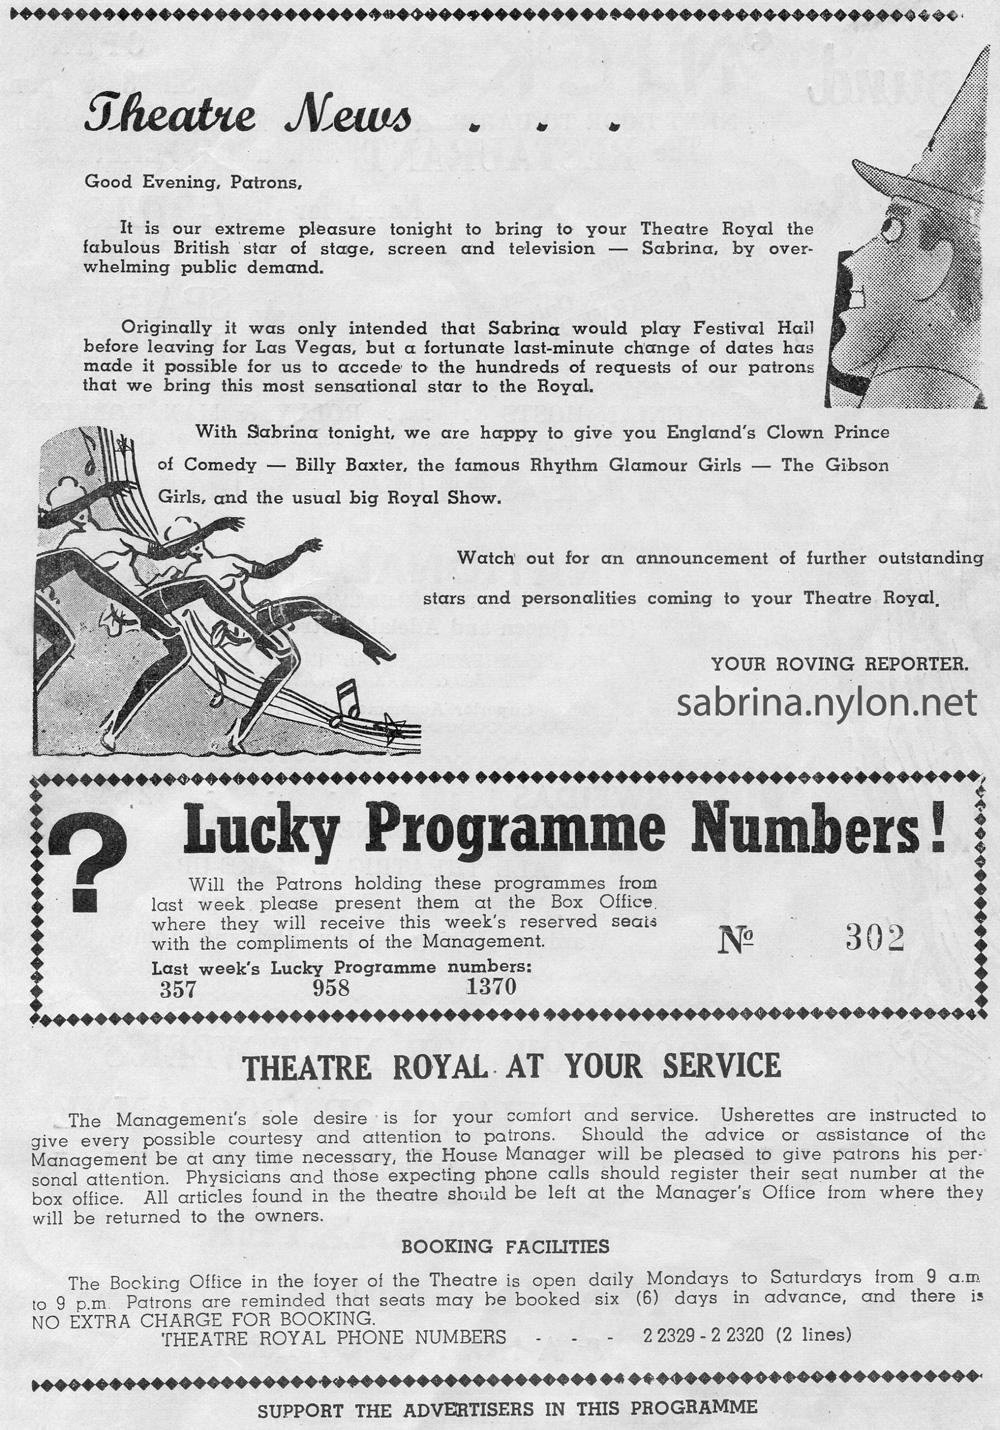 The Sabrina Show (Brisbane 1959)